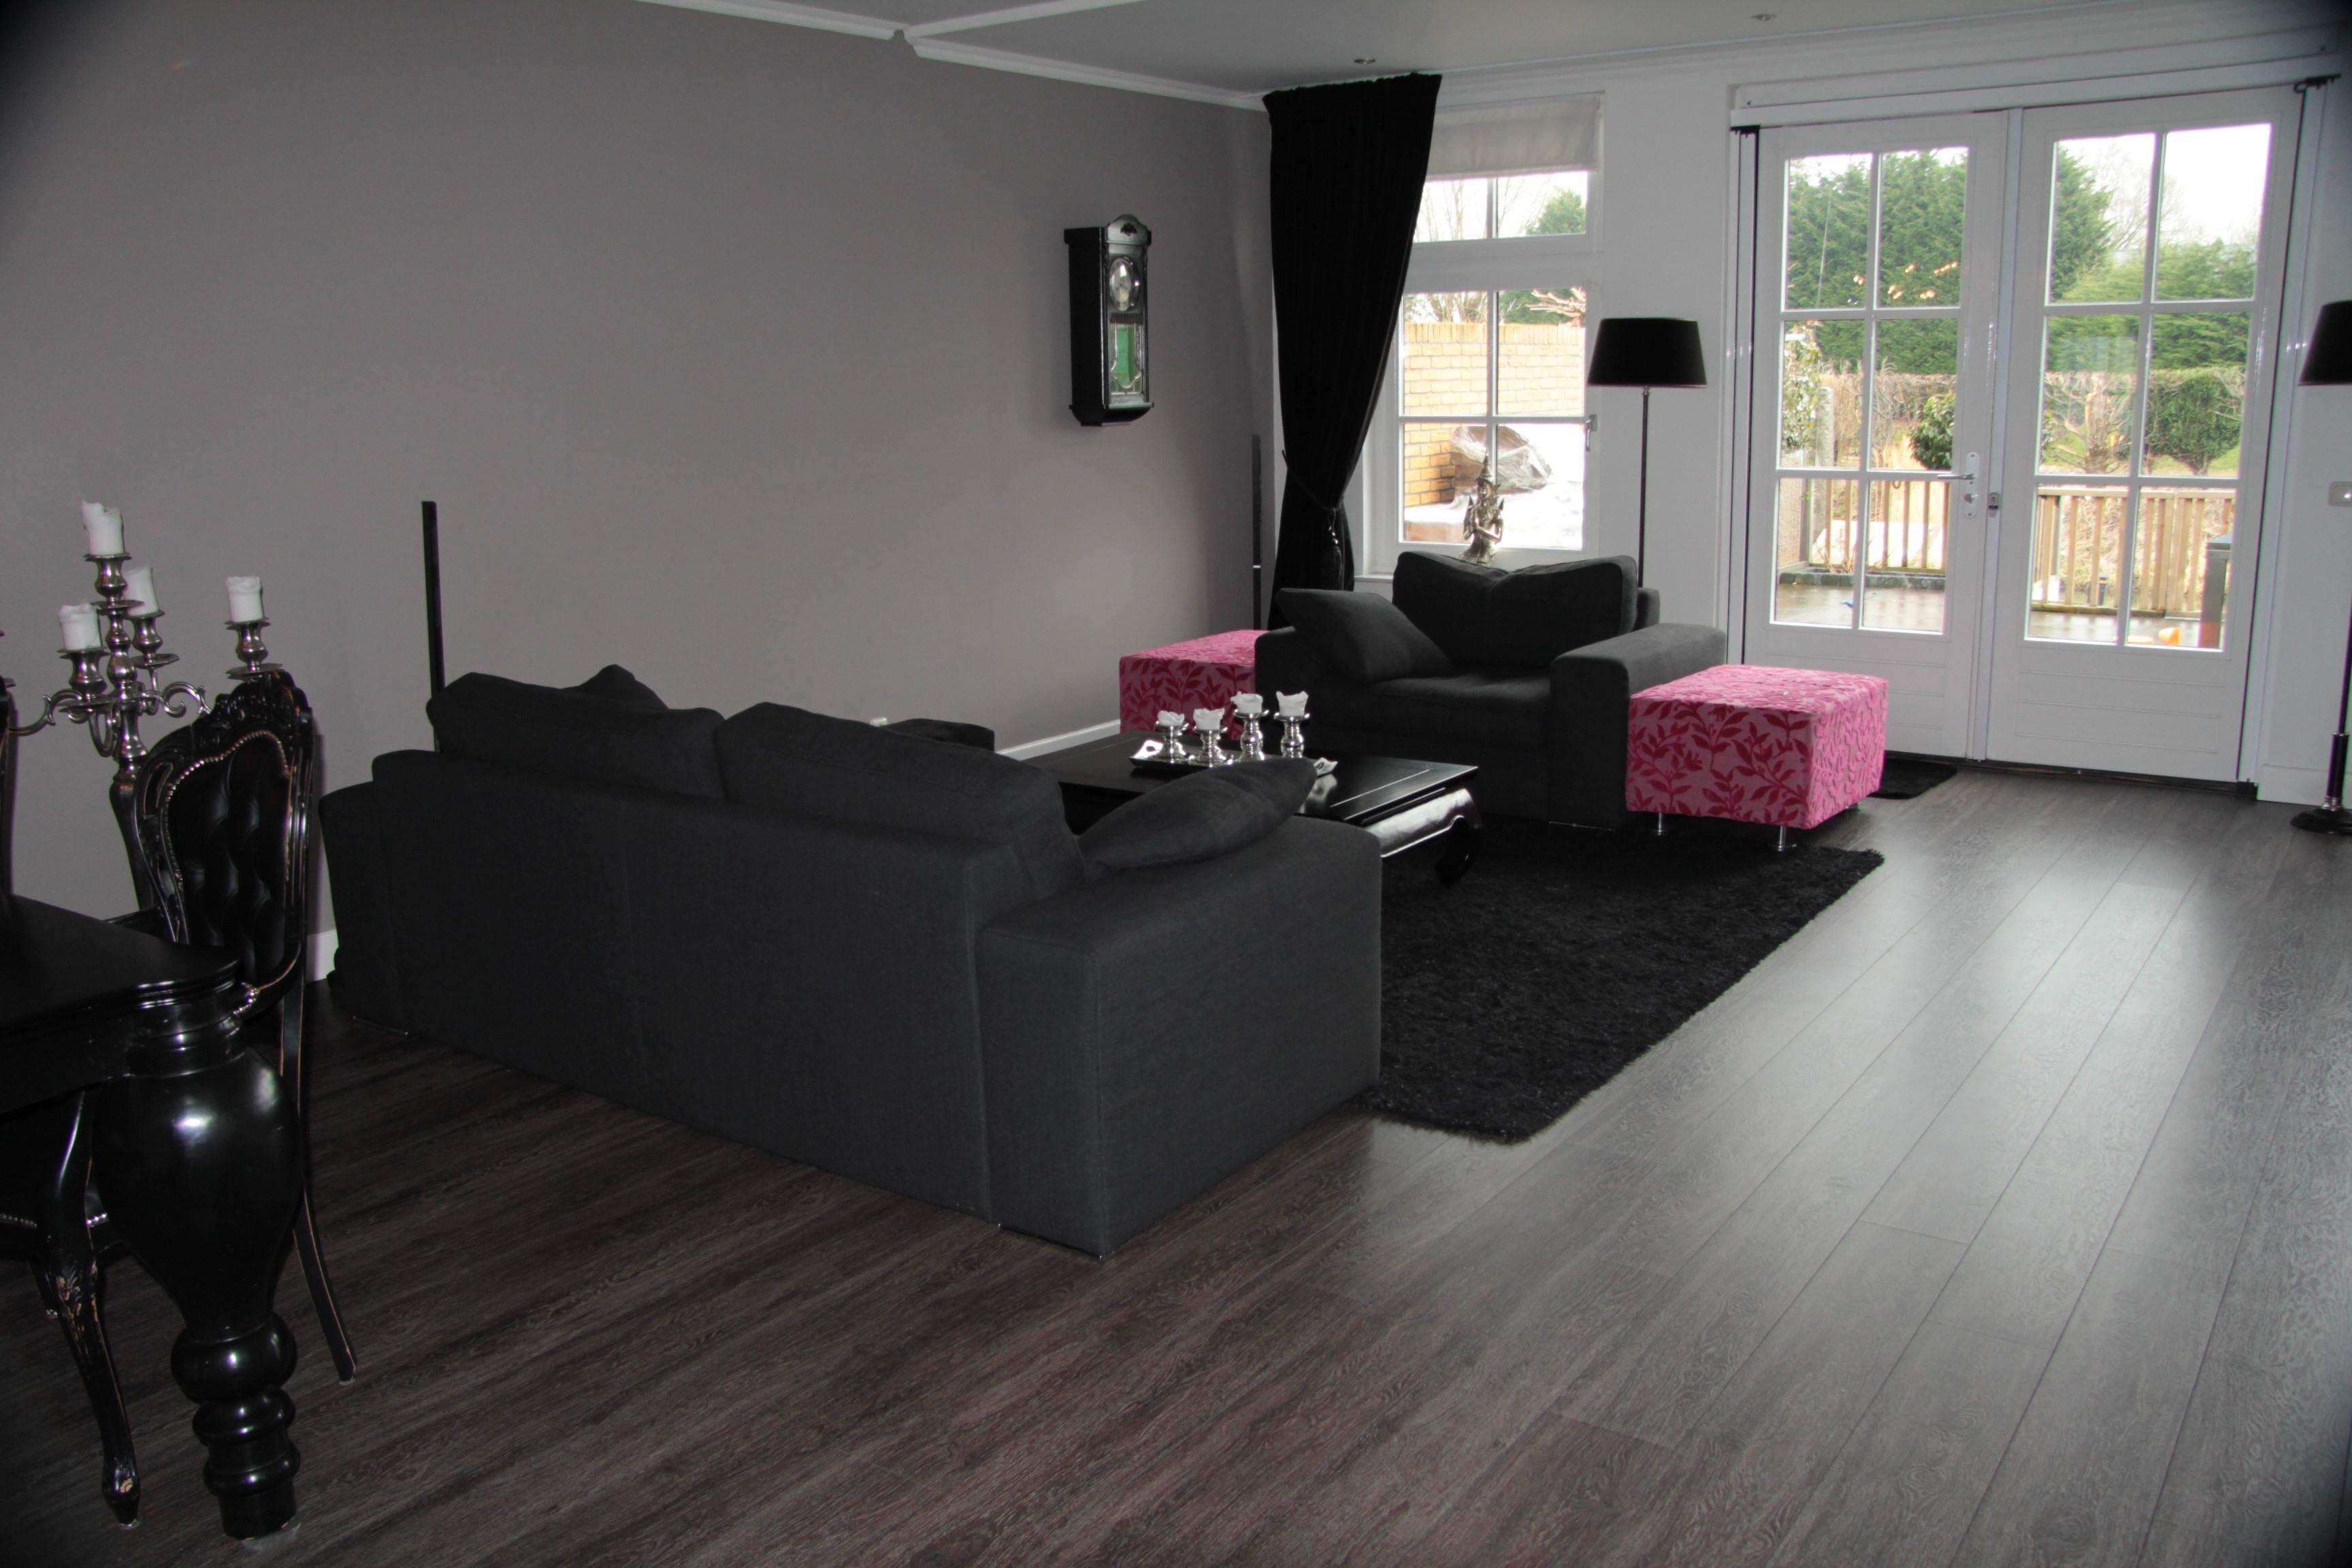 Woonkamer bruine meubels for - Woonkamer meubels ...